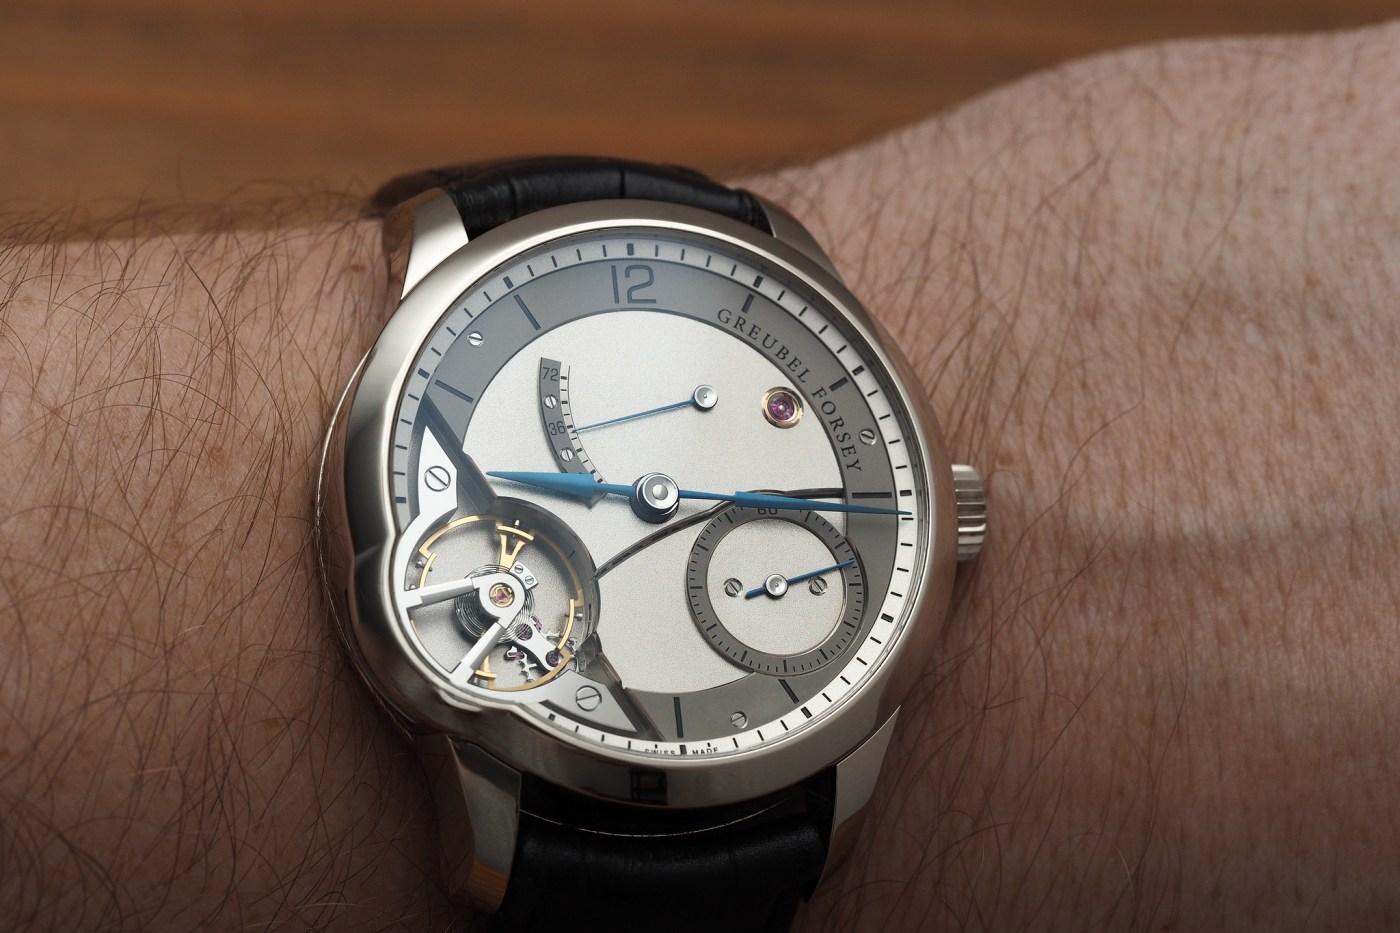 Greubel Forsey Balancier wristshot